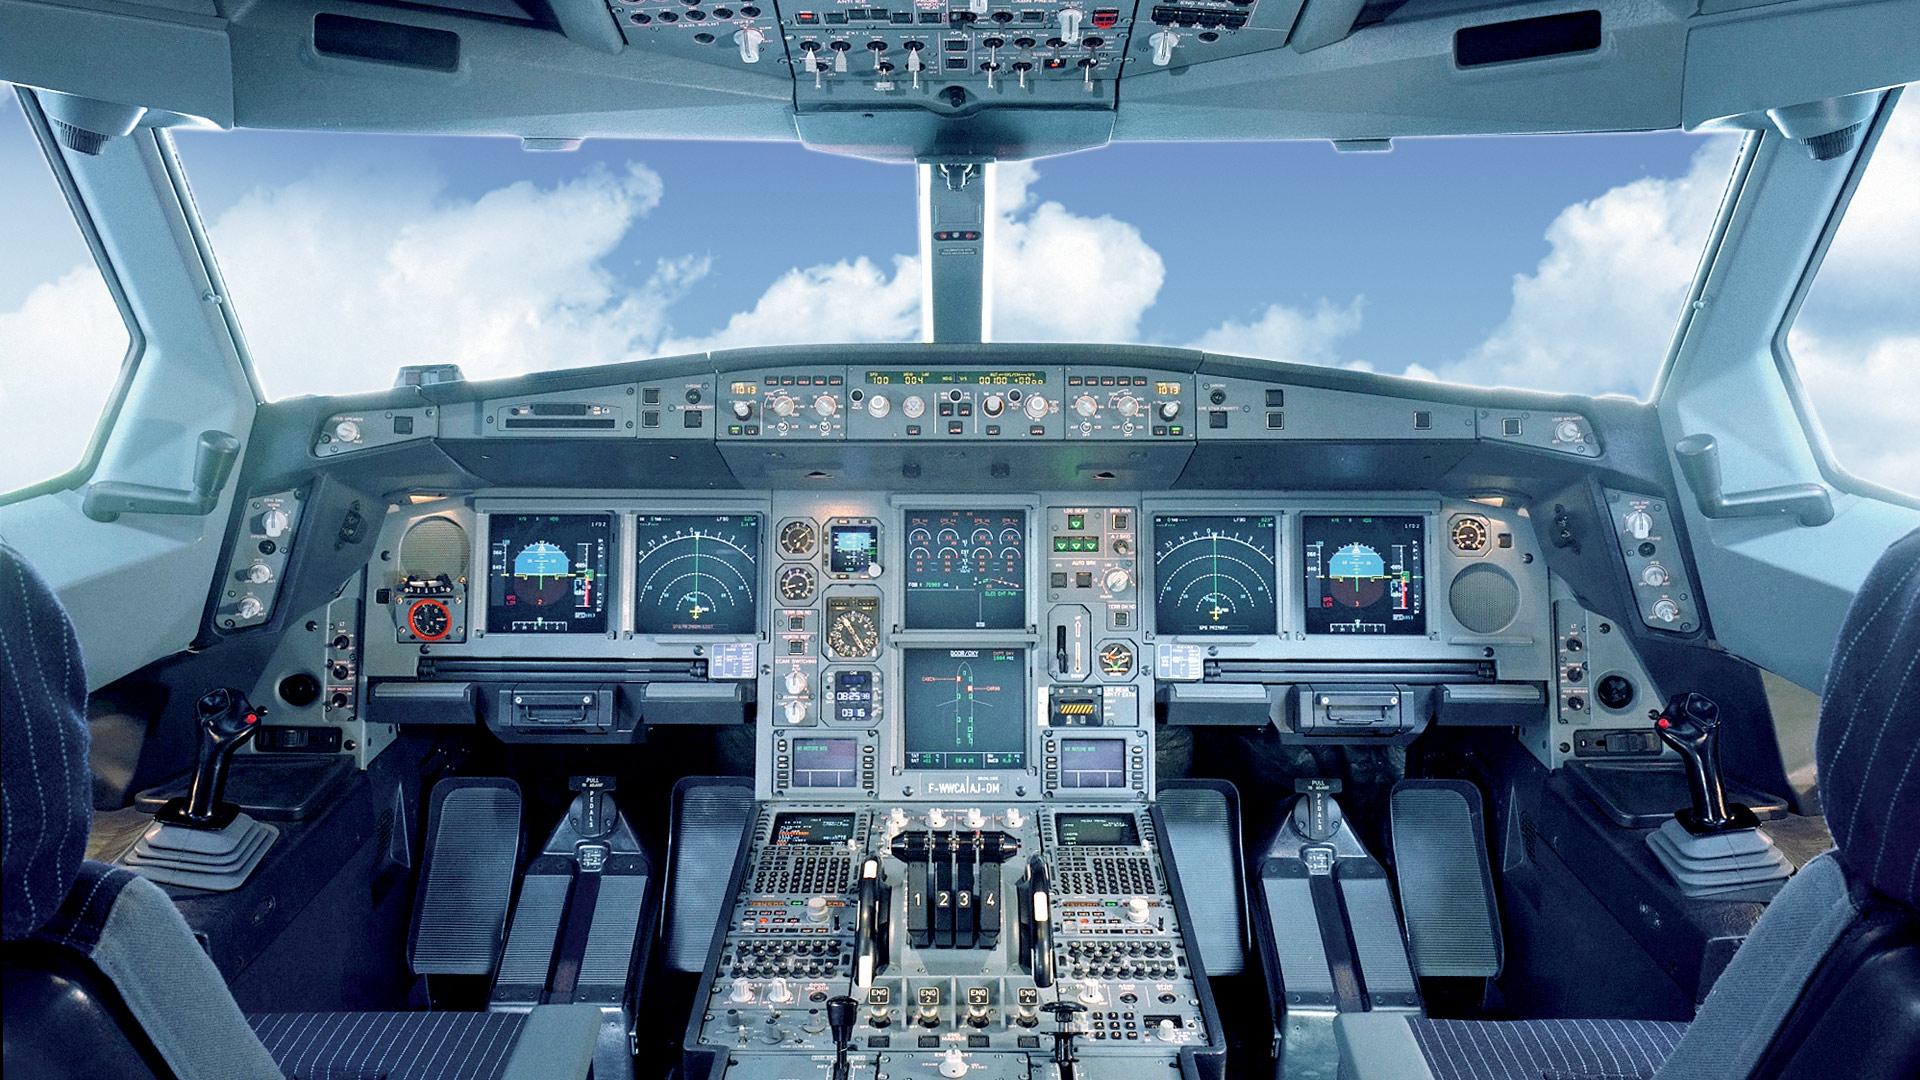 Cockpit Display Unit